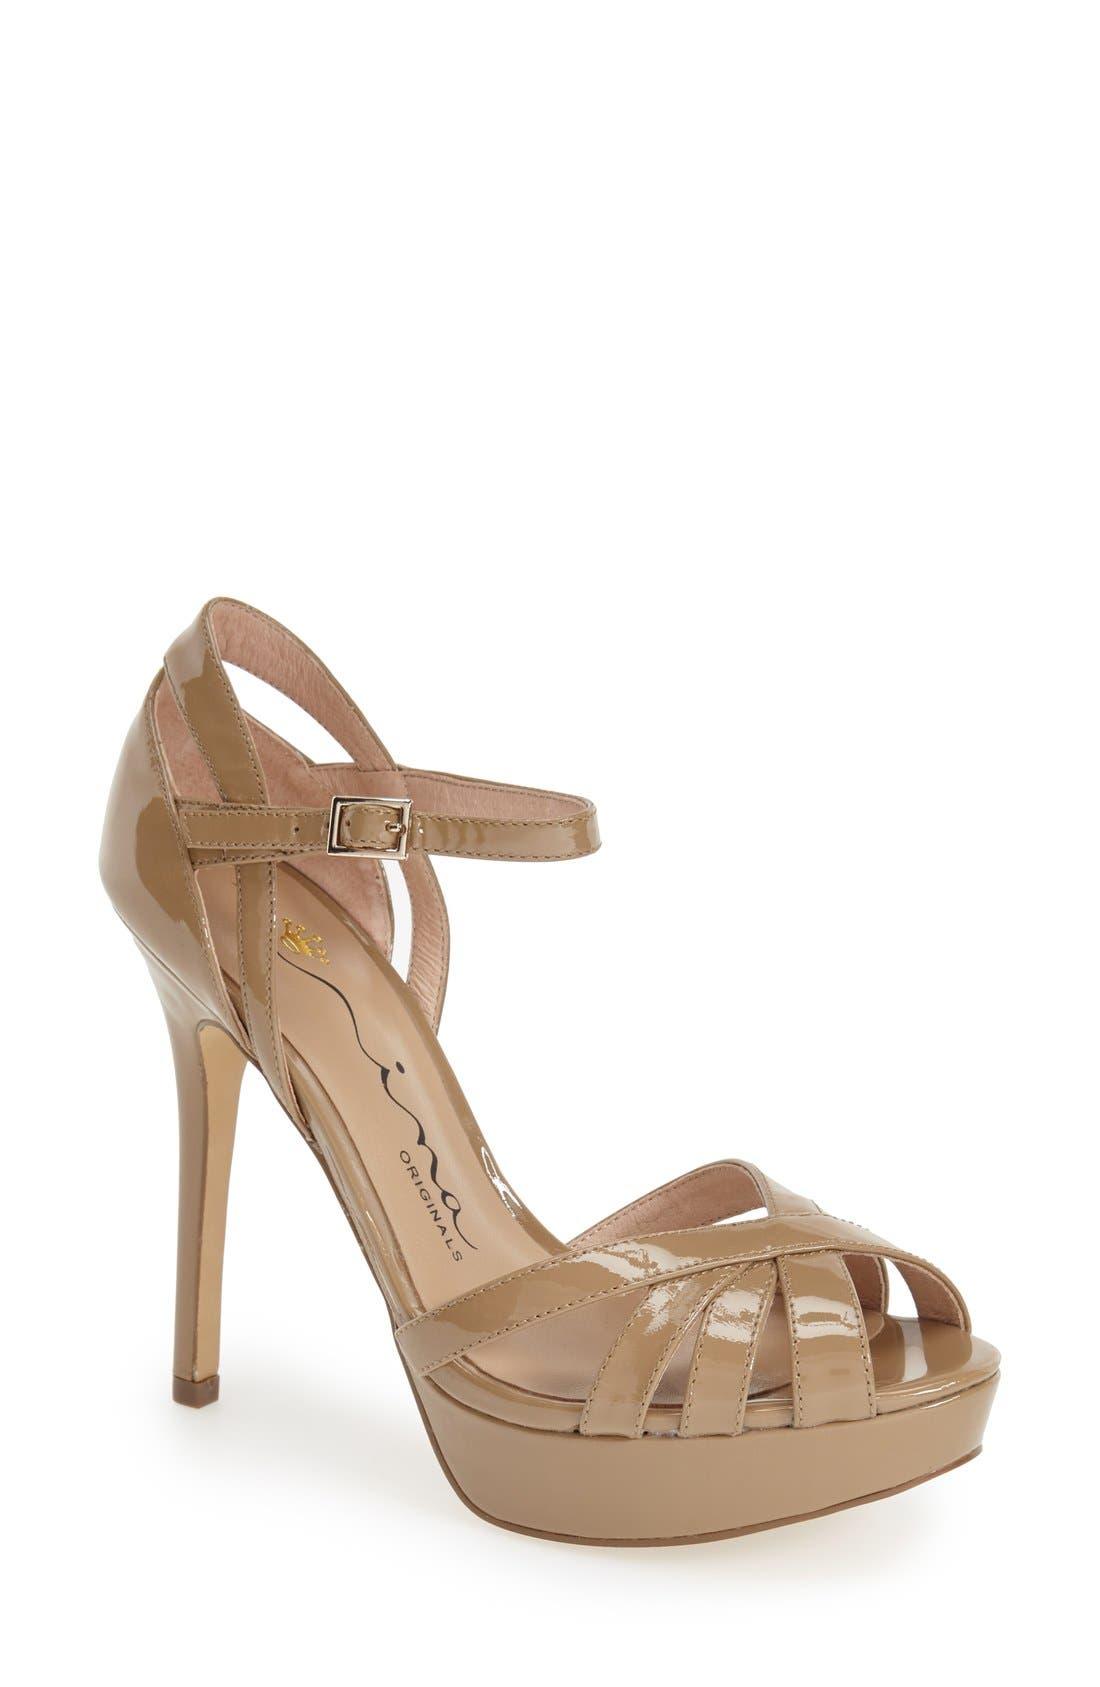 Main Image - Nina Originals 'Senora' Ankle Strap Sandal (Women)